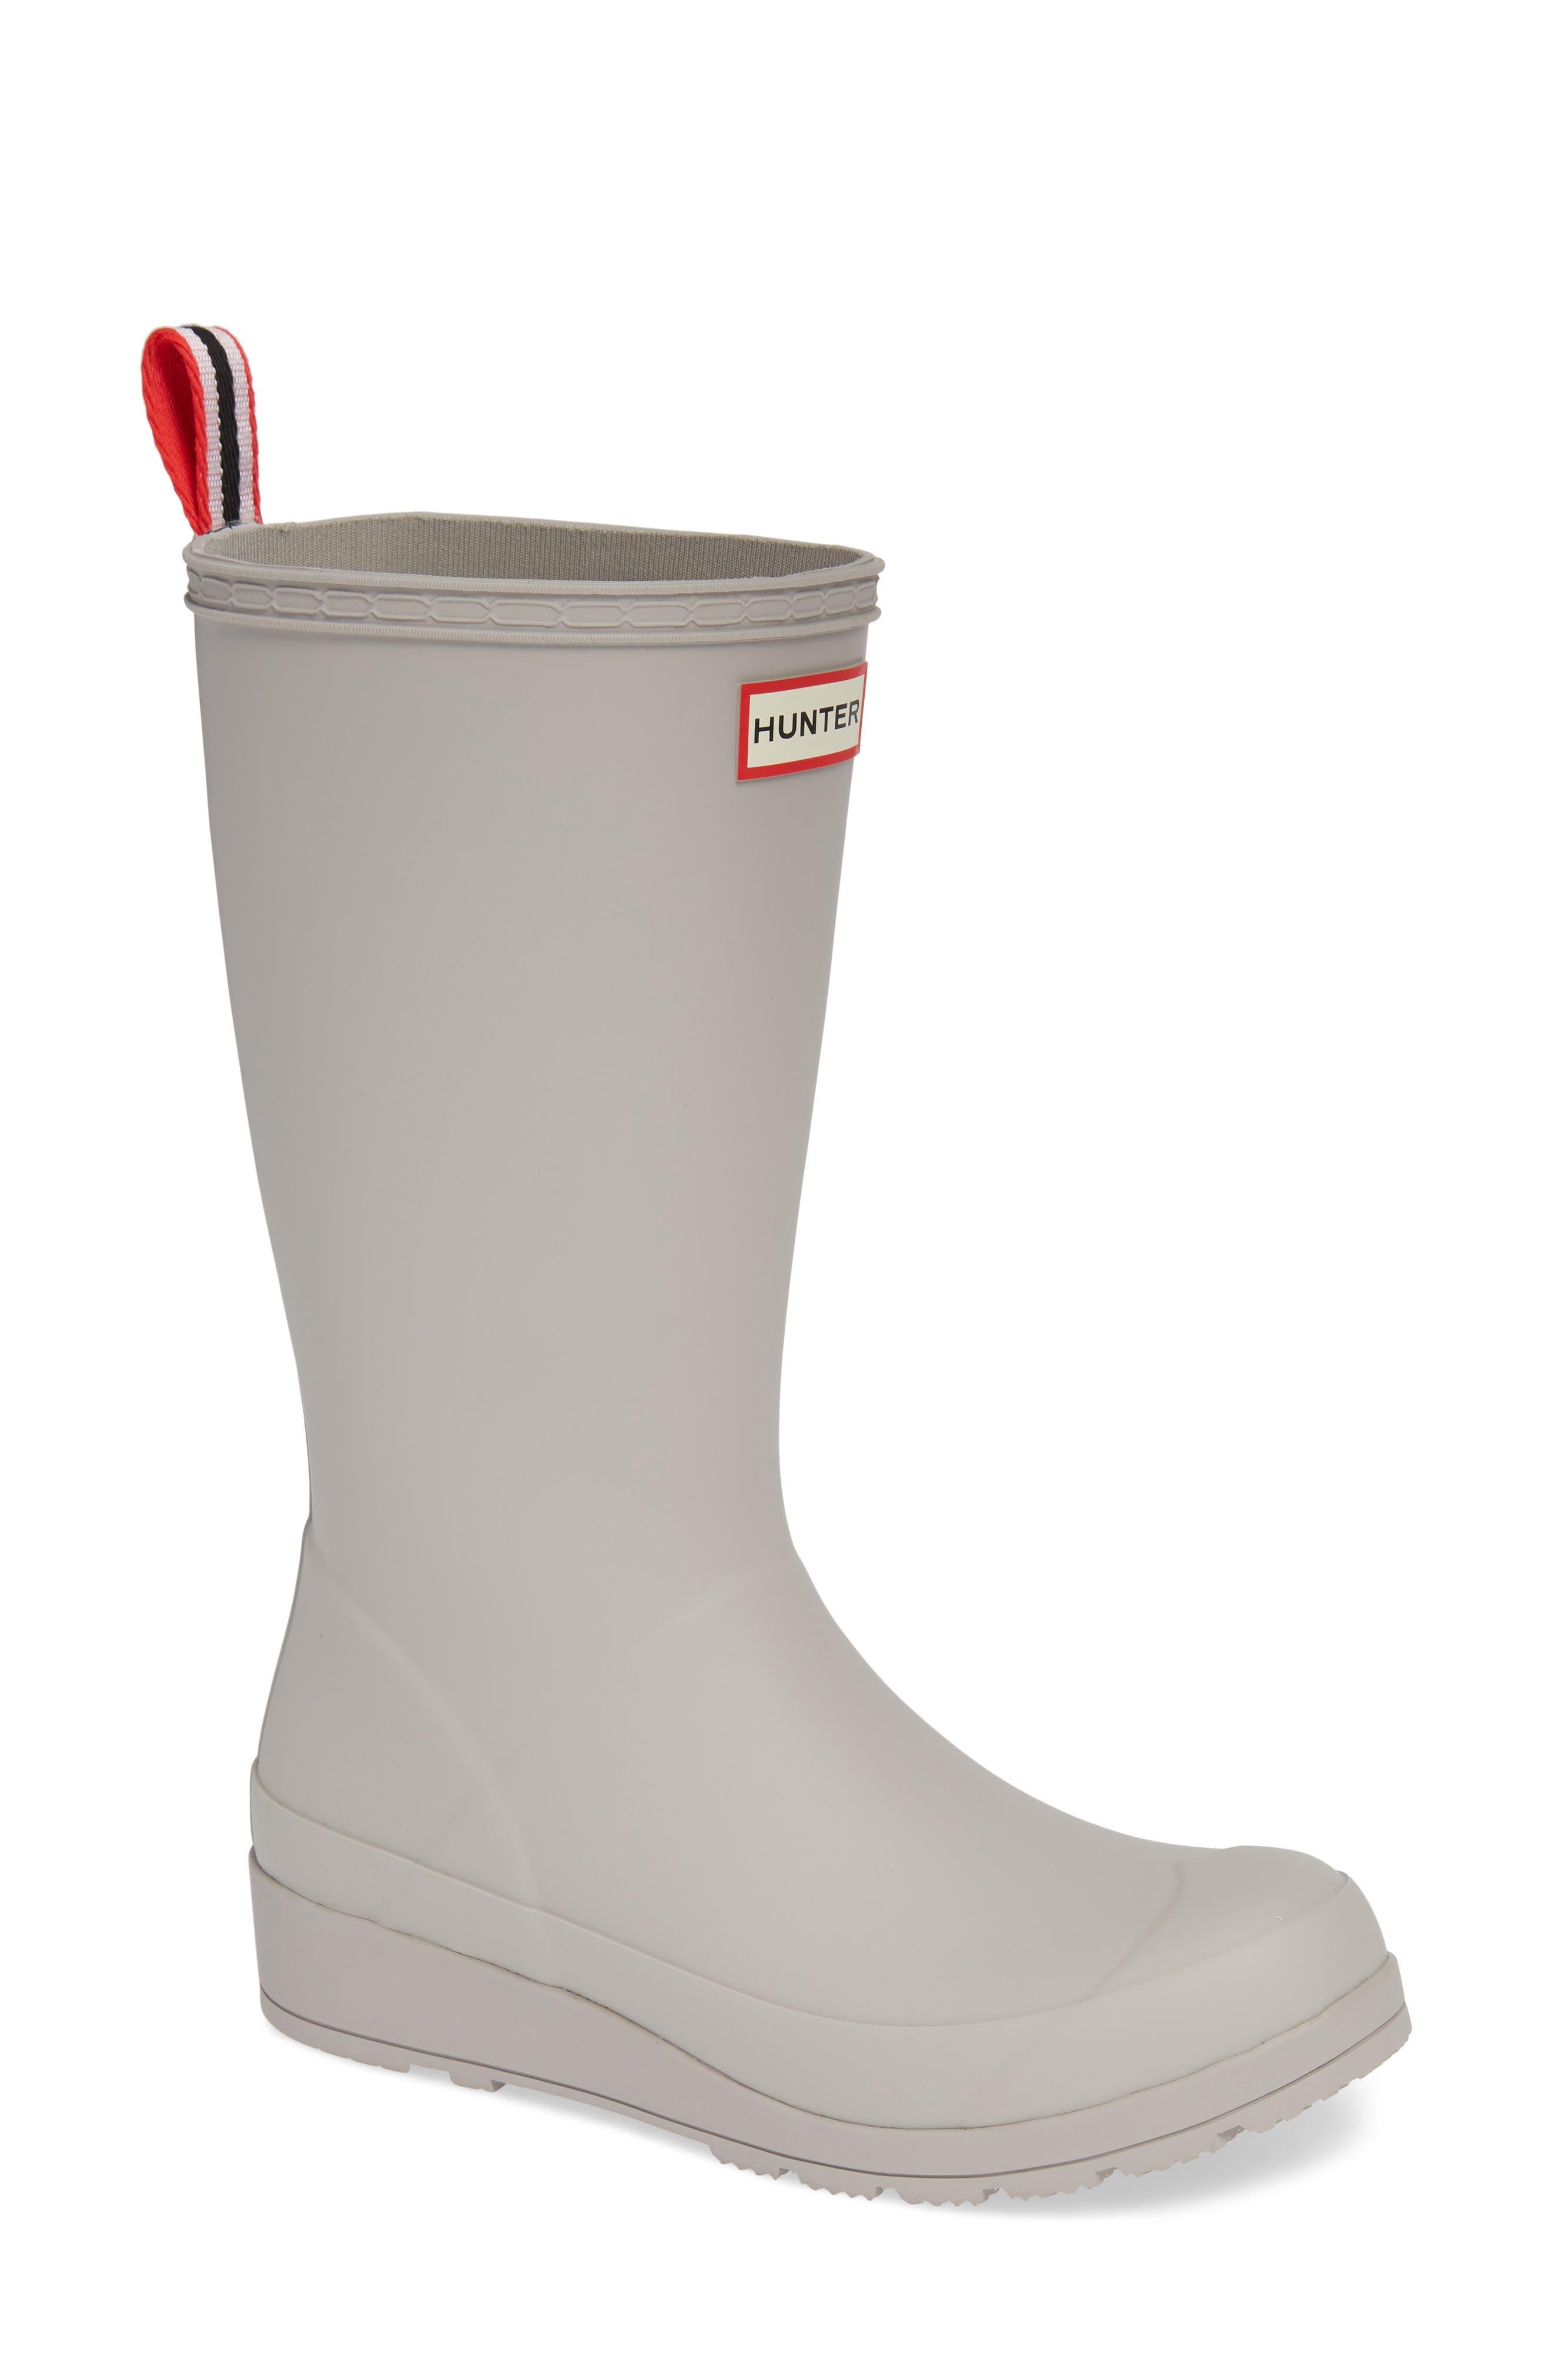 Hunter Original Play Tall Waterproof Rain Boot, Grey